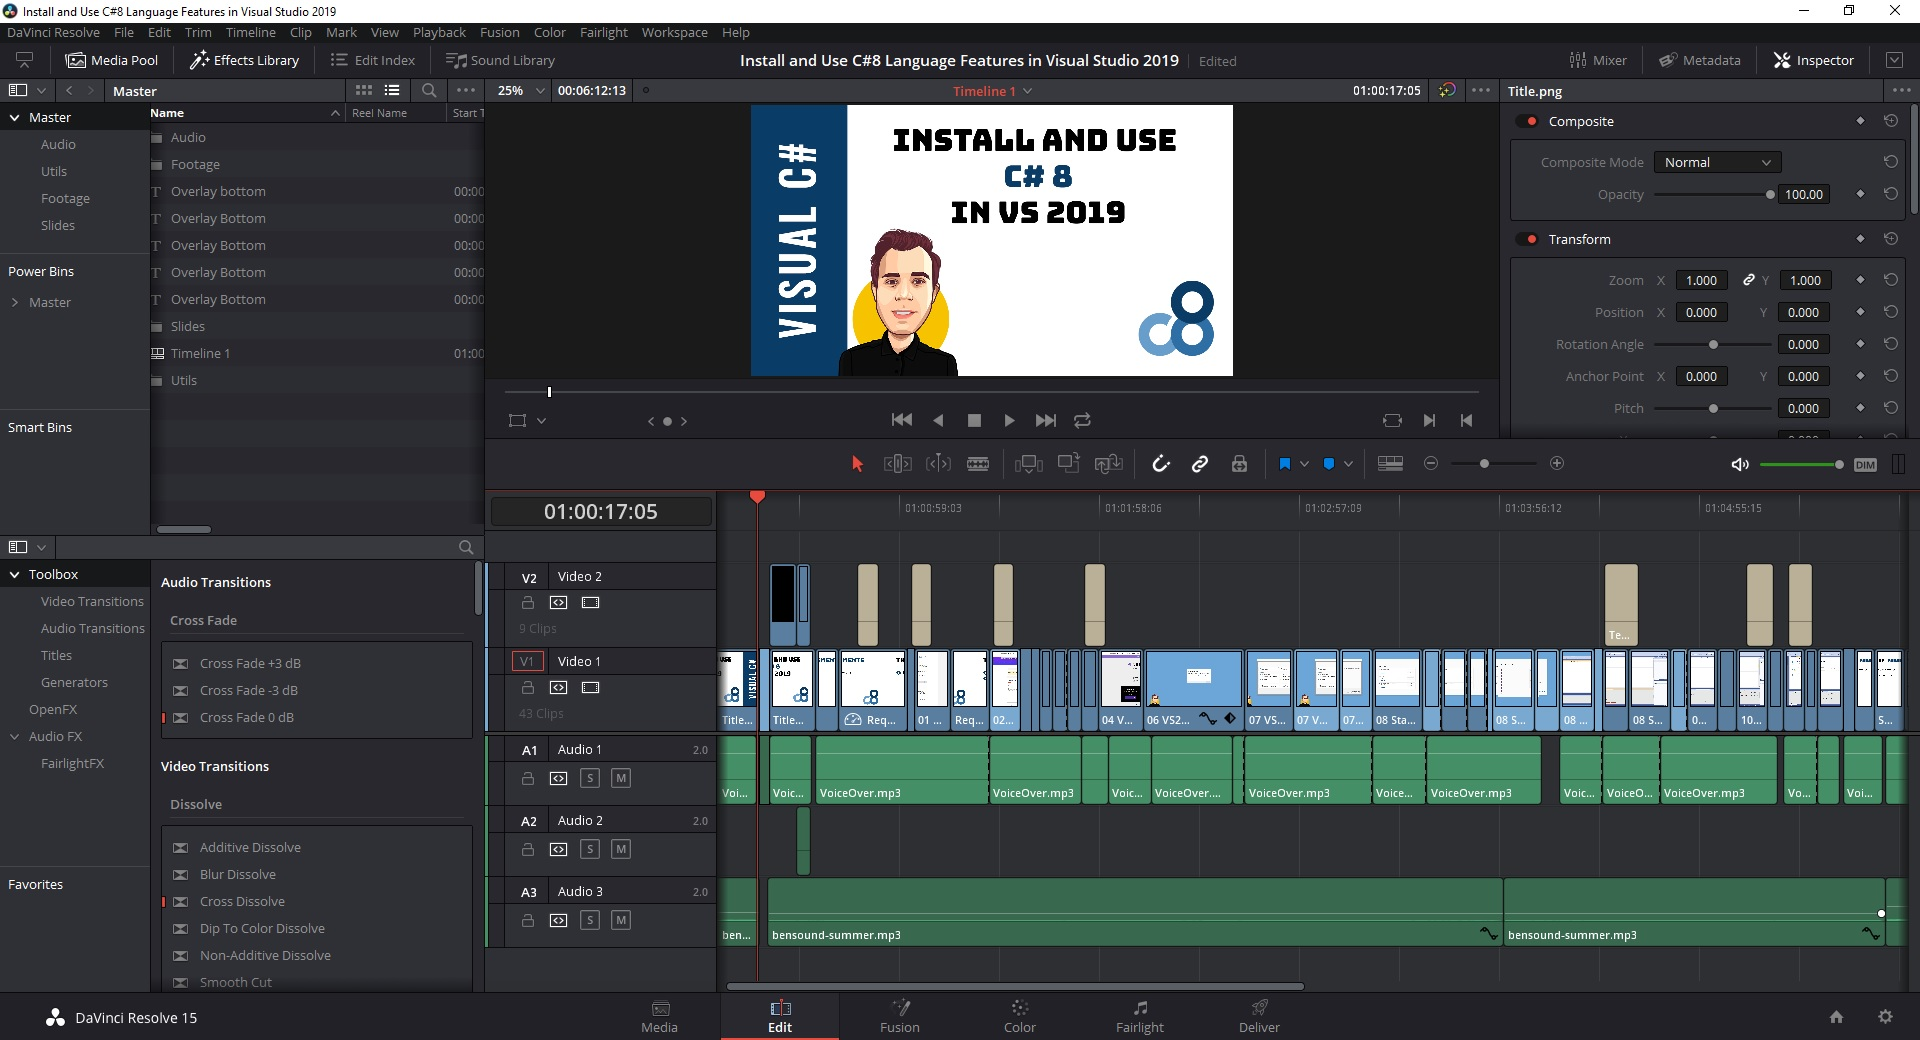 Why I Use DaVinci Resolve 15 for Video Editing | Claudio Bernasconi